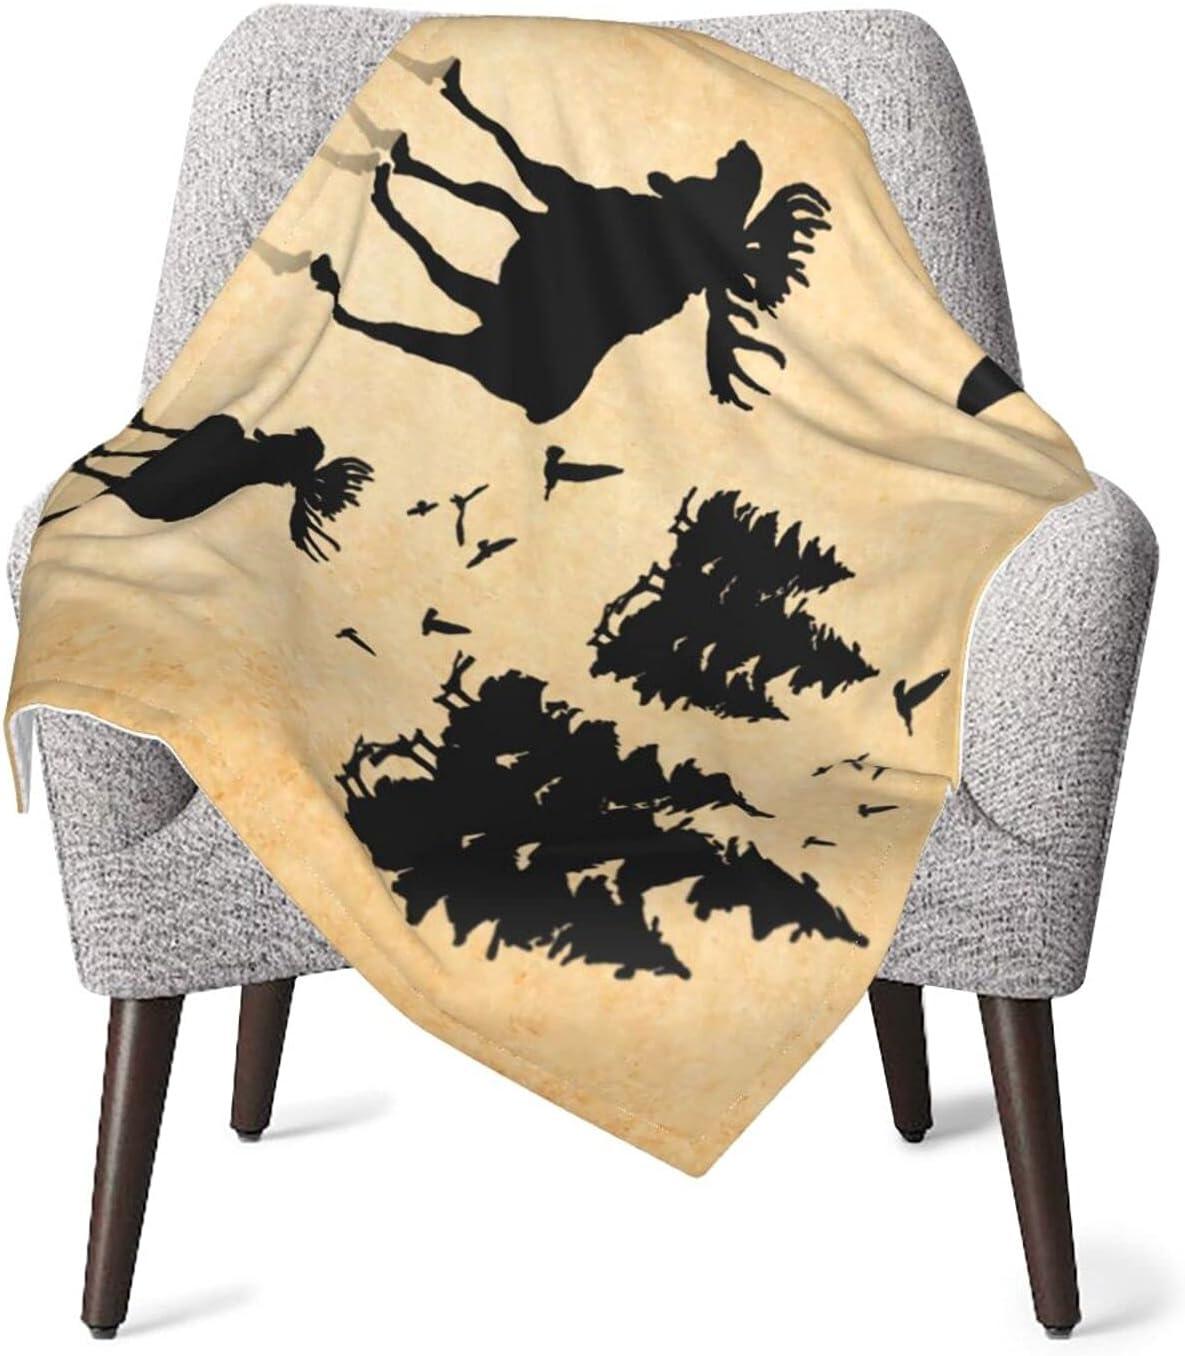 Vintage Animal Moose Al sold out. Limited Special Price Baby Blanket for Toddler Girls S Super Boys